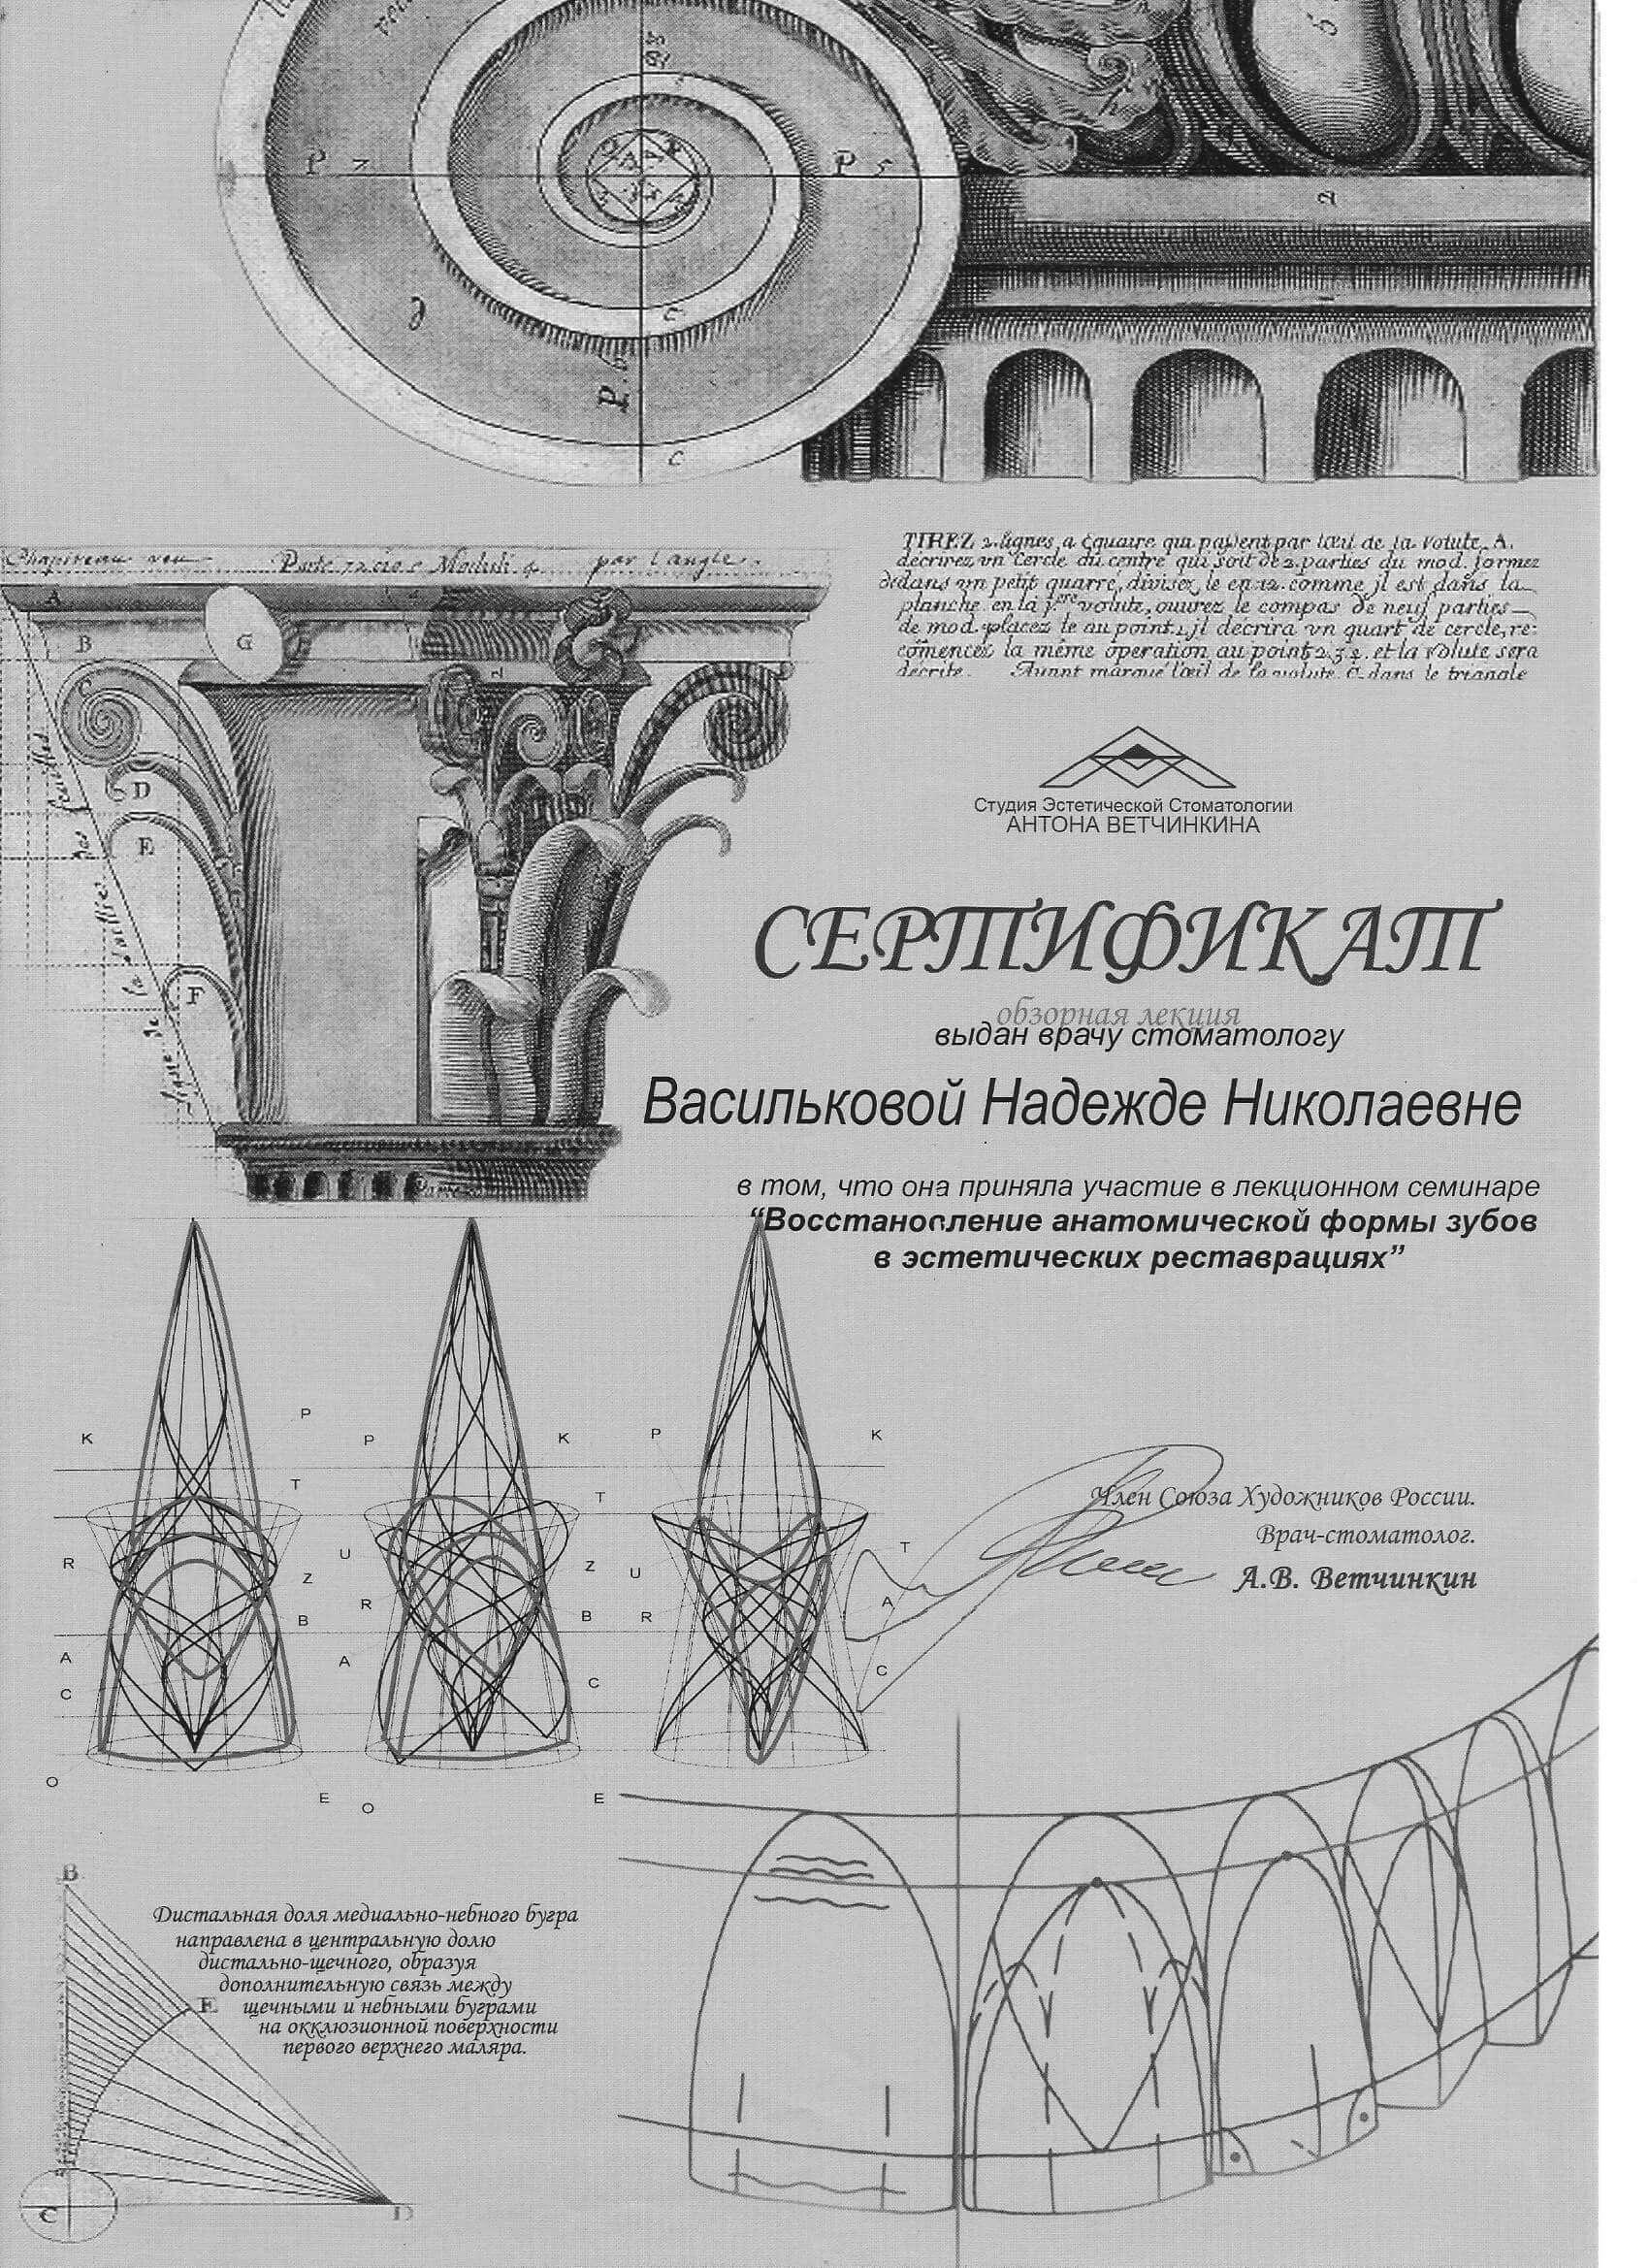 Сертификат Ветчинкин Реставрация